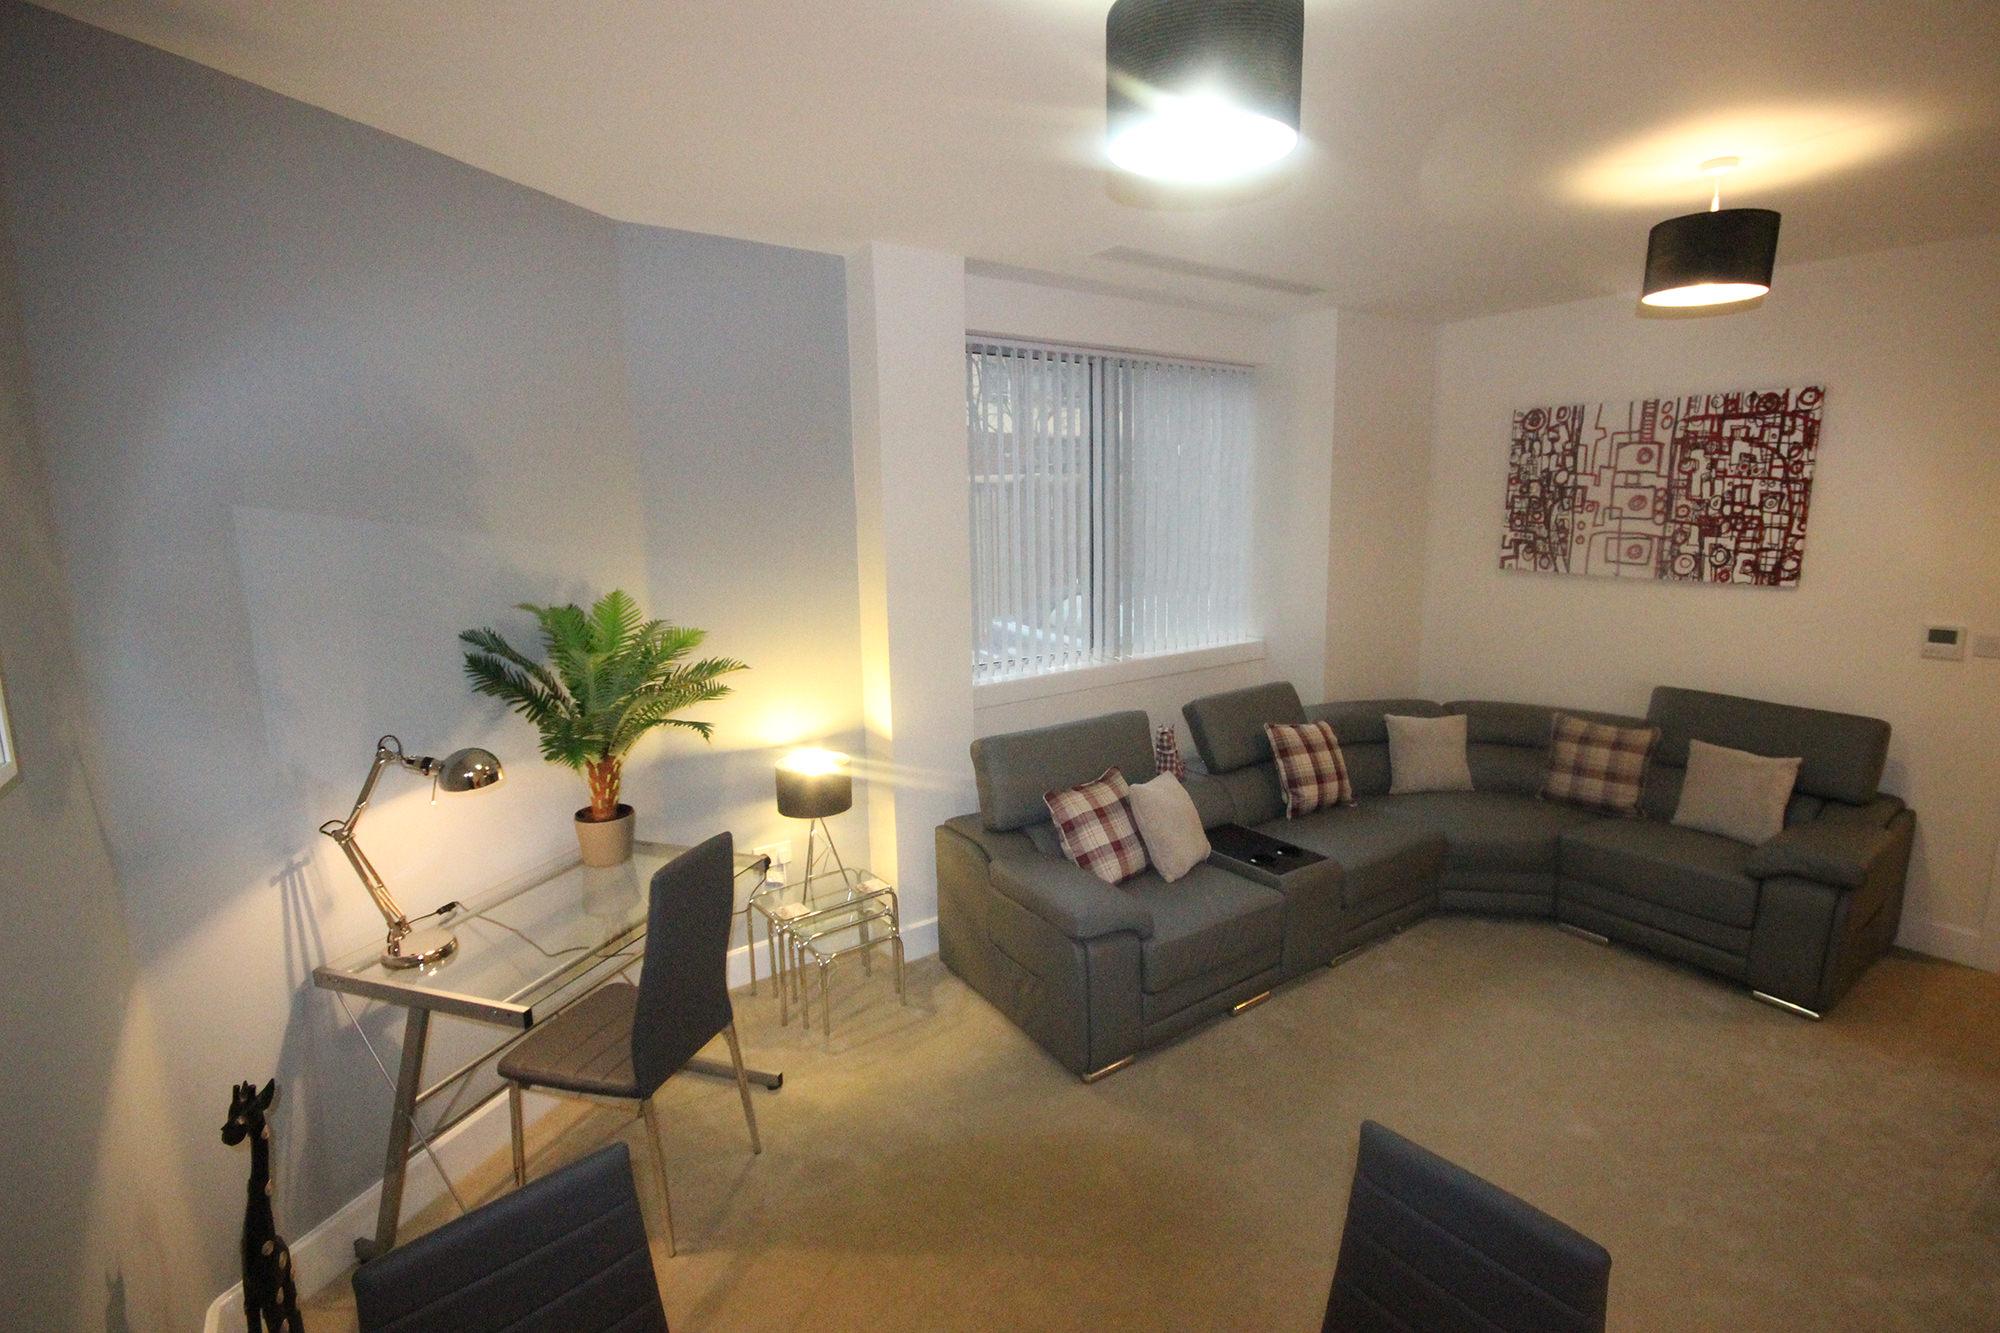 Charter House U2013 2 Bedroom Executive Apartment